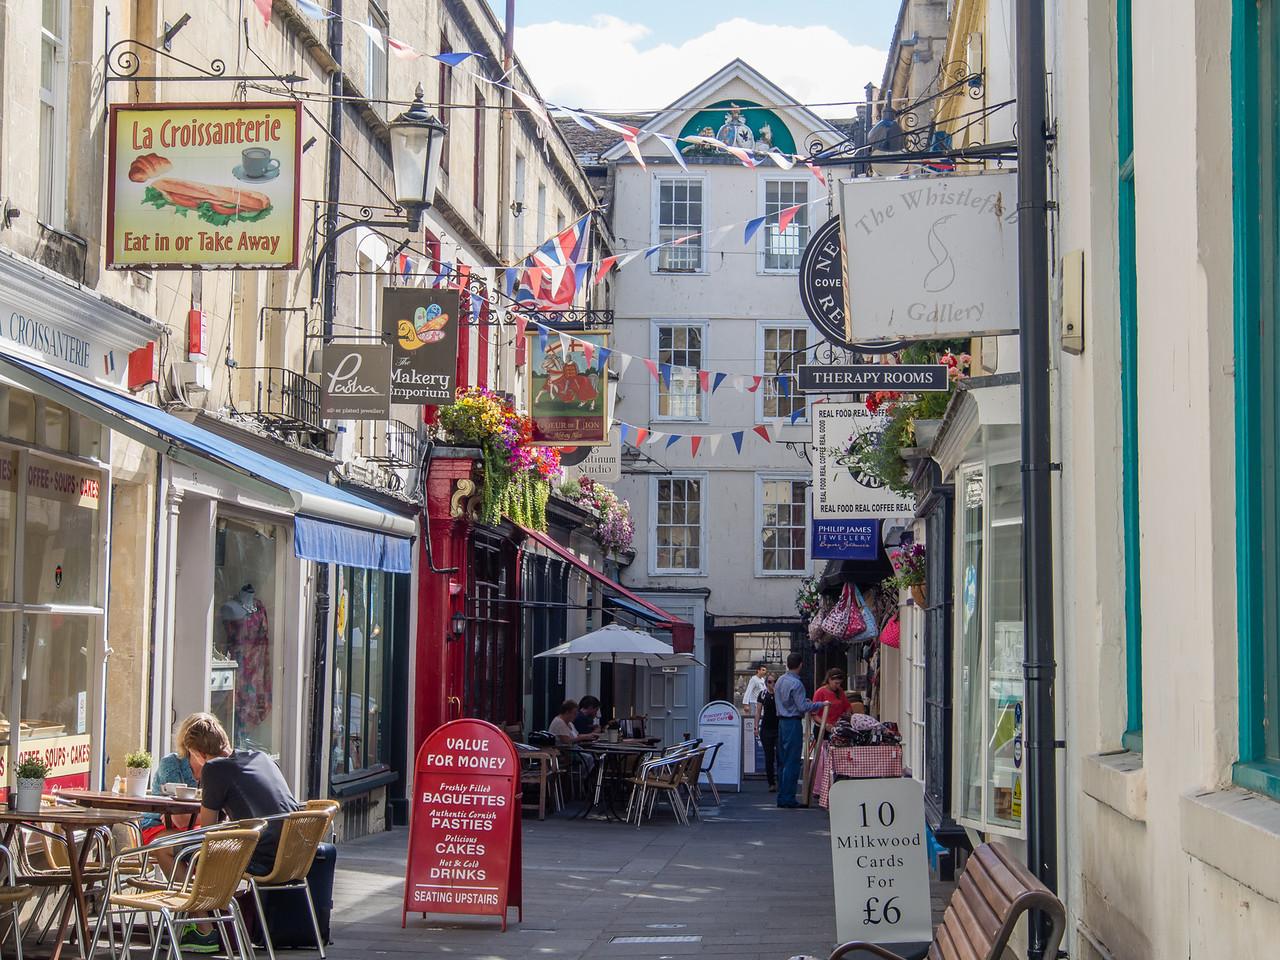 Alley Way in Bath